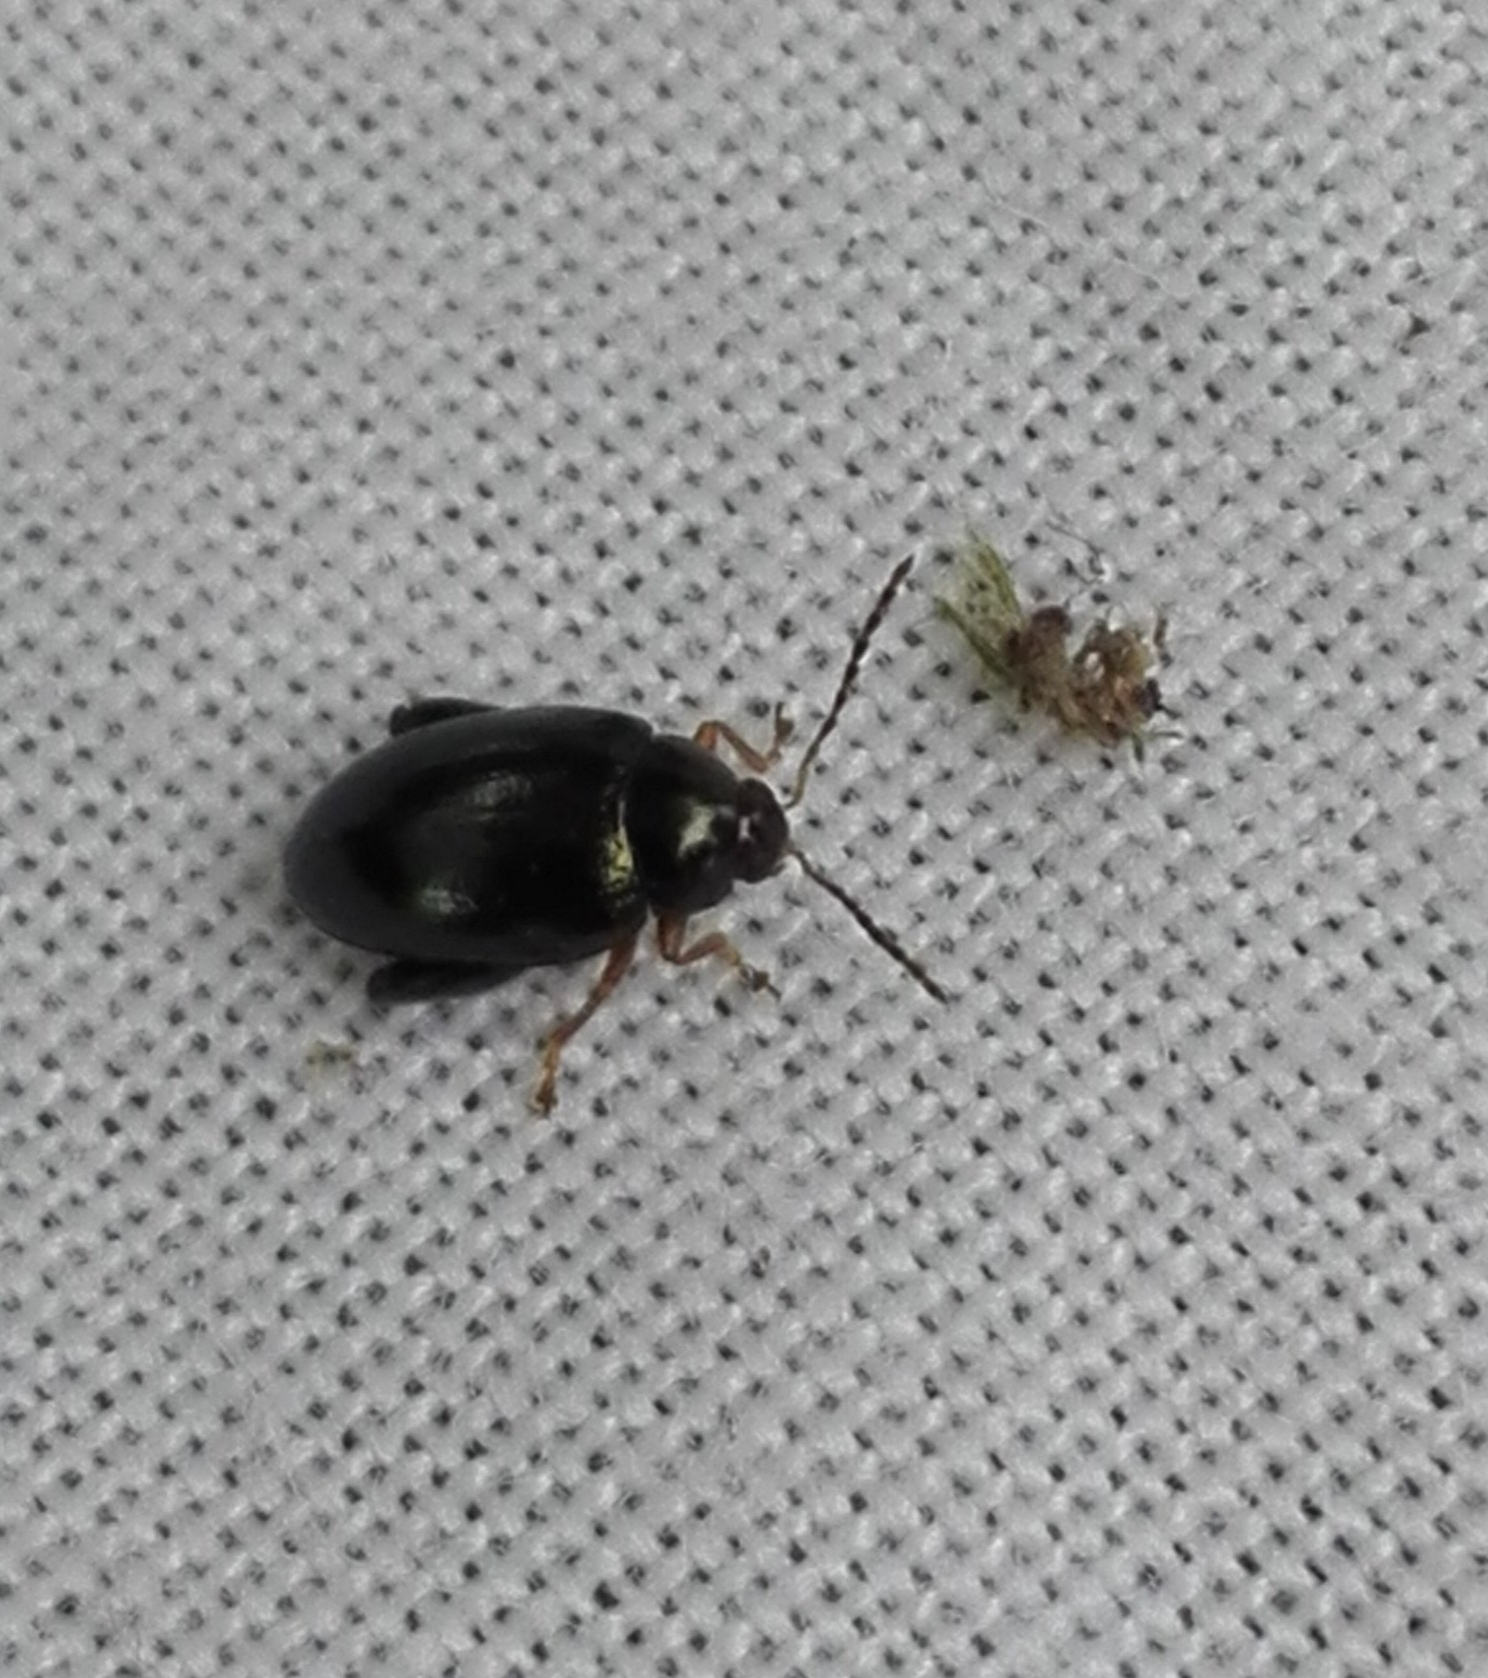 #161 Crepidodera fulvicornis Flea beetle